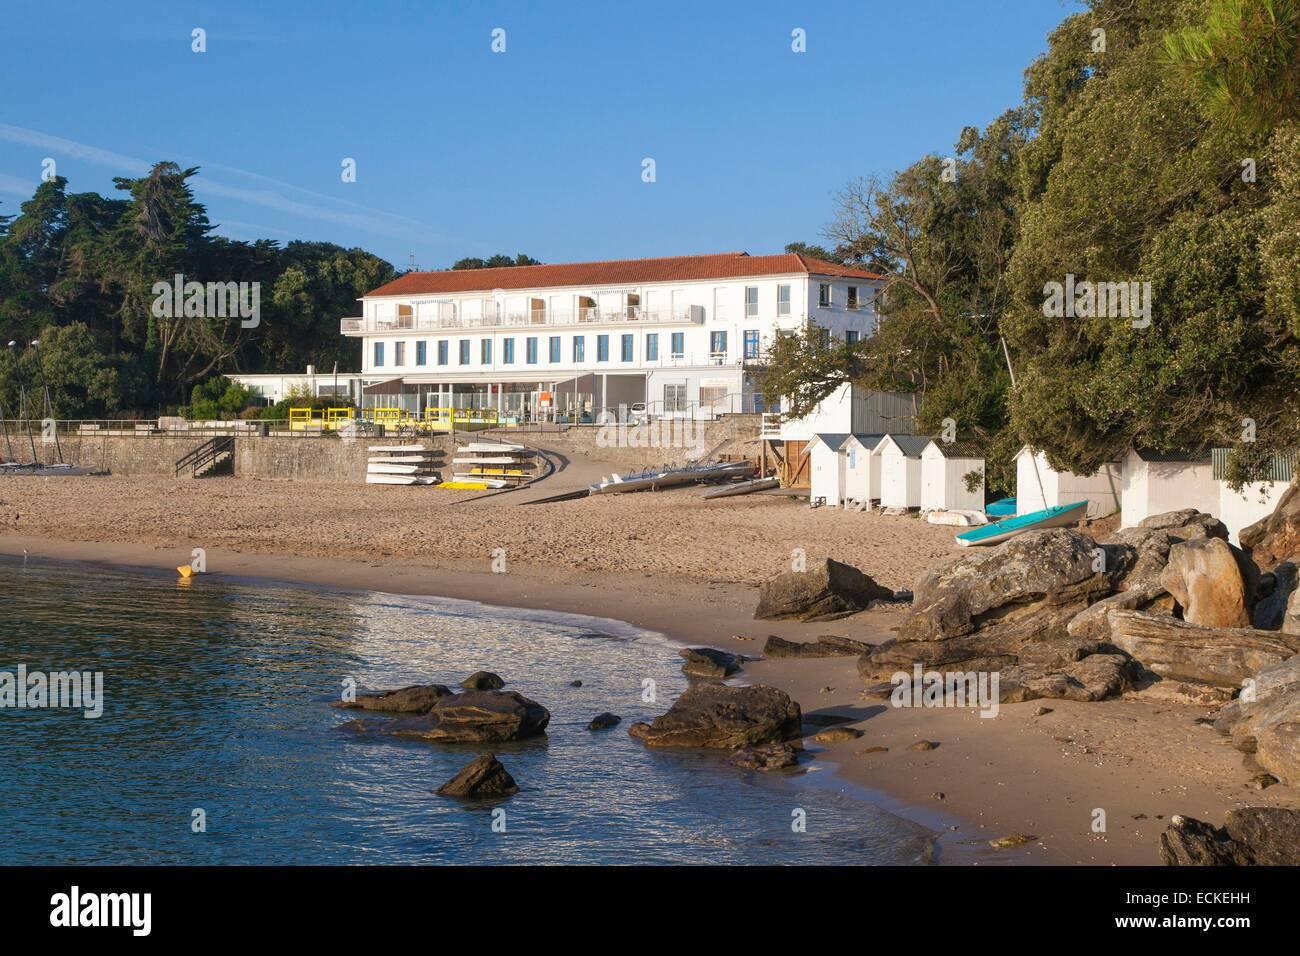 France Vendee Ile De Noirmoutier Bois La Chaise Beach Des Dames And Restaurant That Served As Backdrop To The Film Holiday Breakfast Nicolas